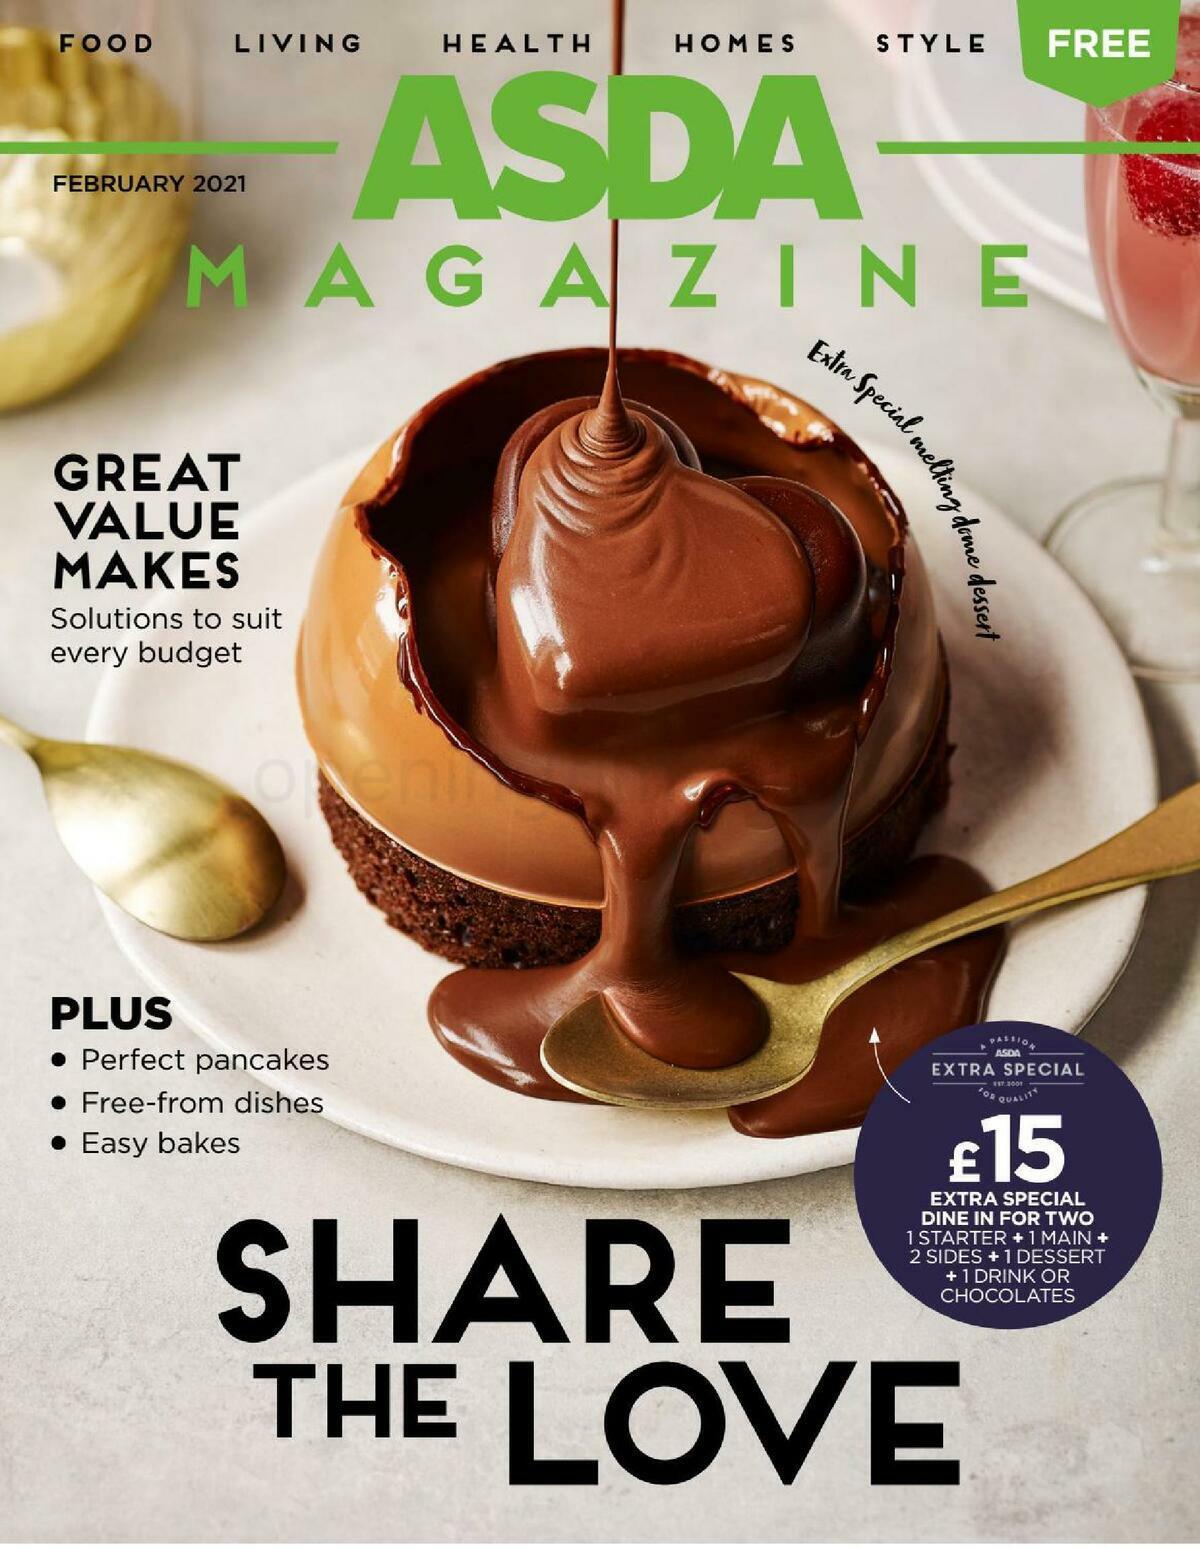 ASDA Magazine February Offers from February 1